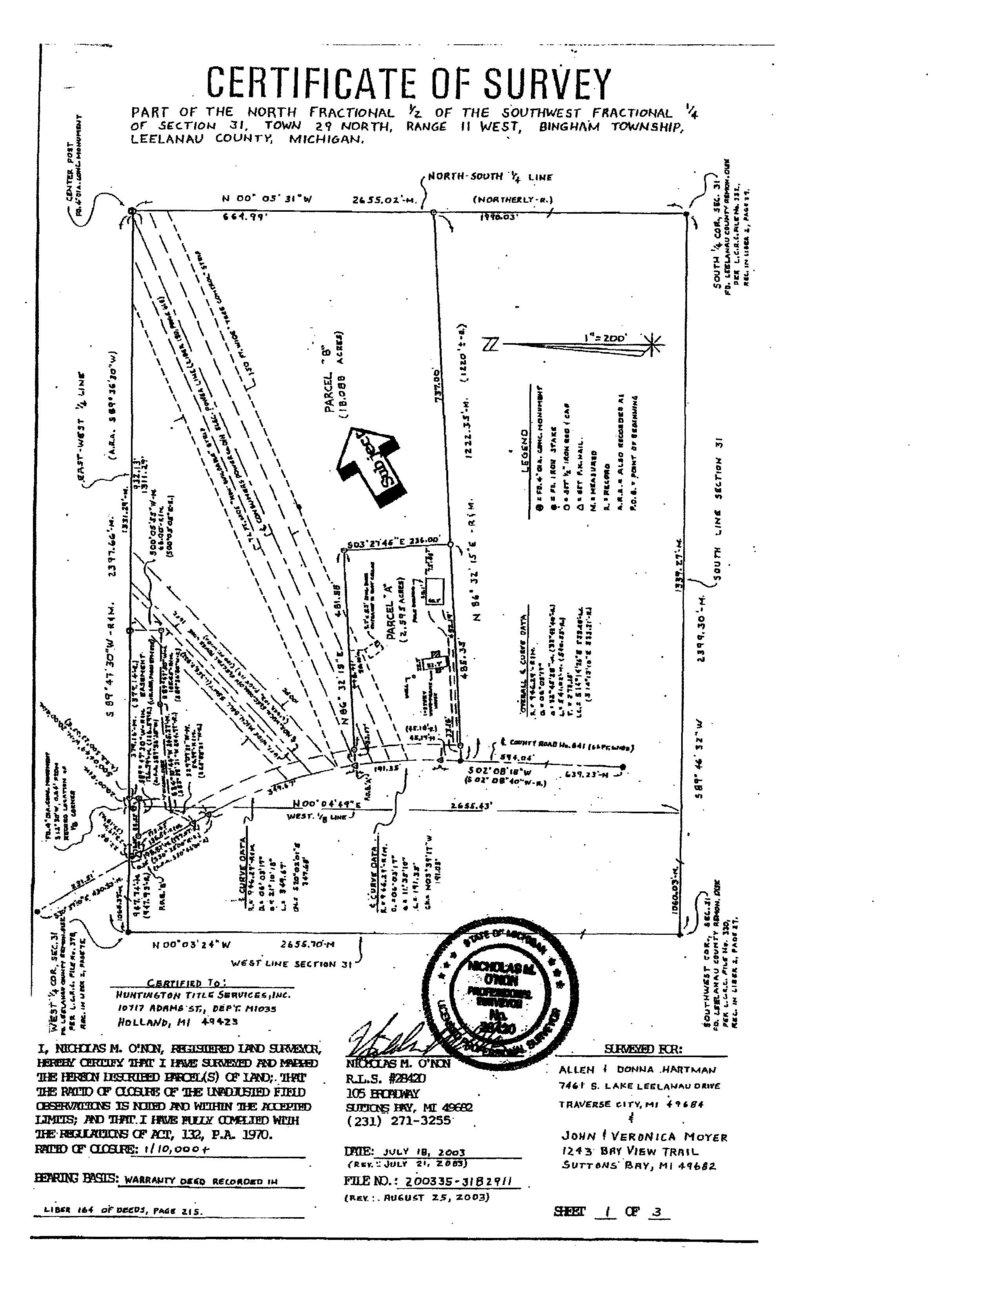 7311 S Lake Leelanau Drive, Traverse City Acreage for sale in Leelanau County by Oltersdorf Realty LLC (6).jpg